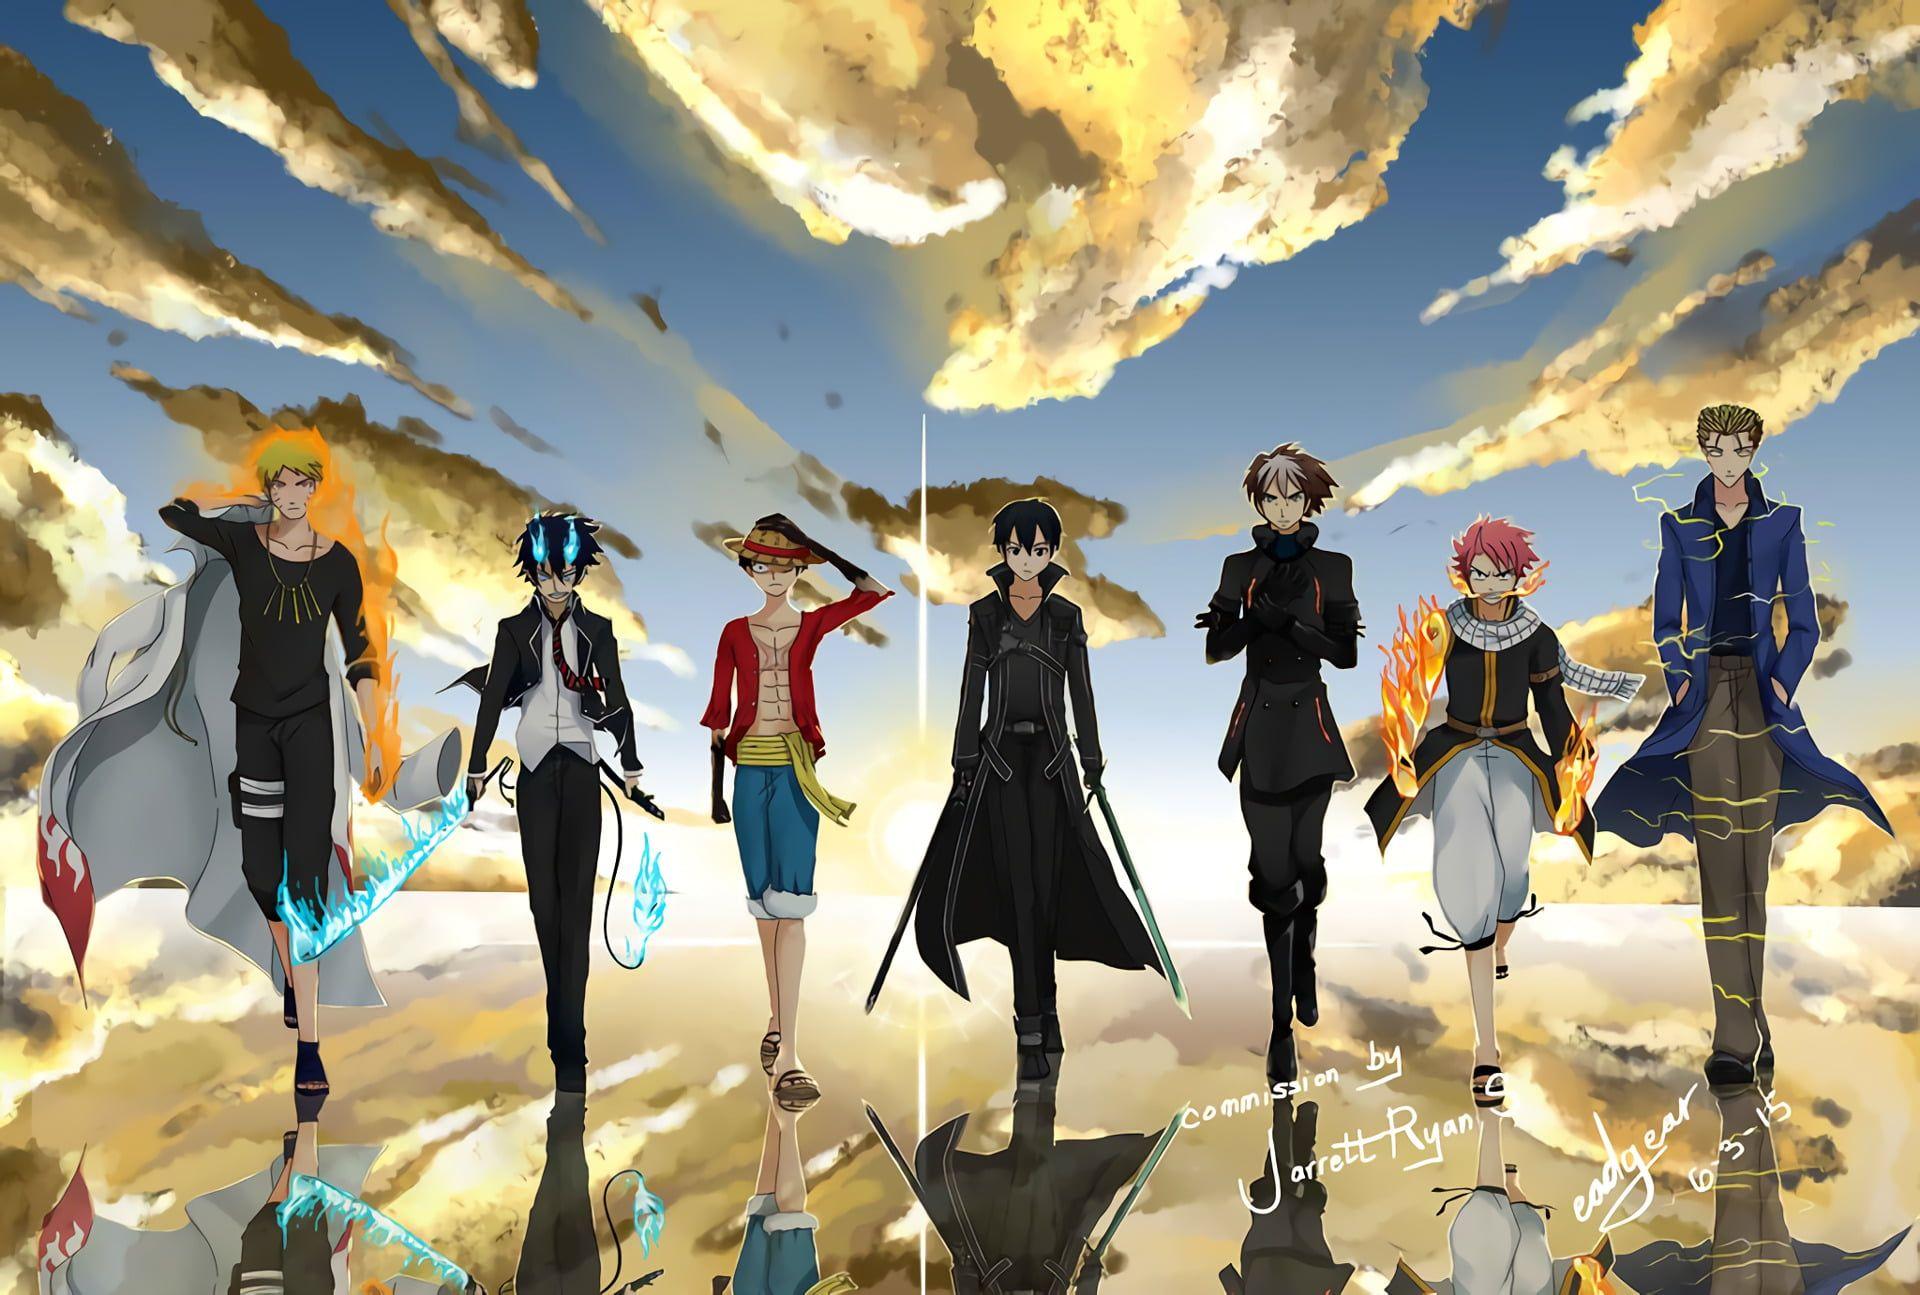 One Piece Character Wallpaper Anime Crossover Blue Exorcist Fairy Tail Kazuto Kirigaya Kirito S Anime Wallpaper Live Anime Crossover Blue Exorcist Wallpaper Anime crossover wallpaper 1920x1080